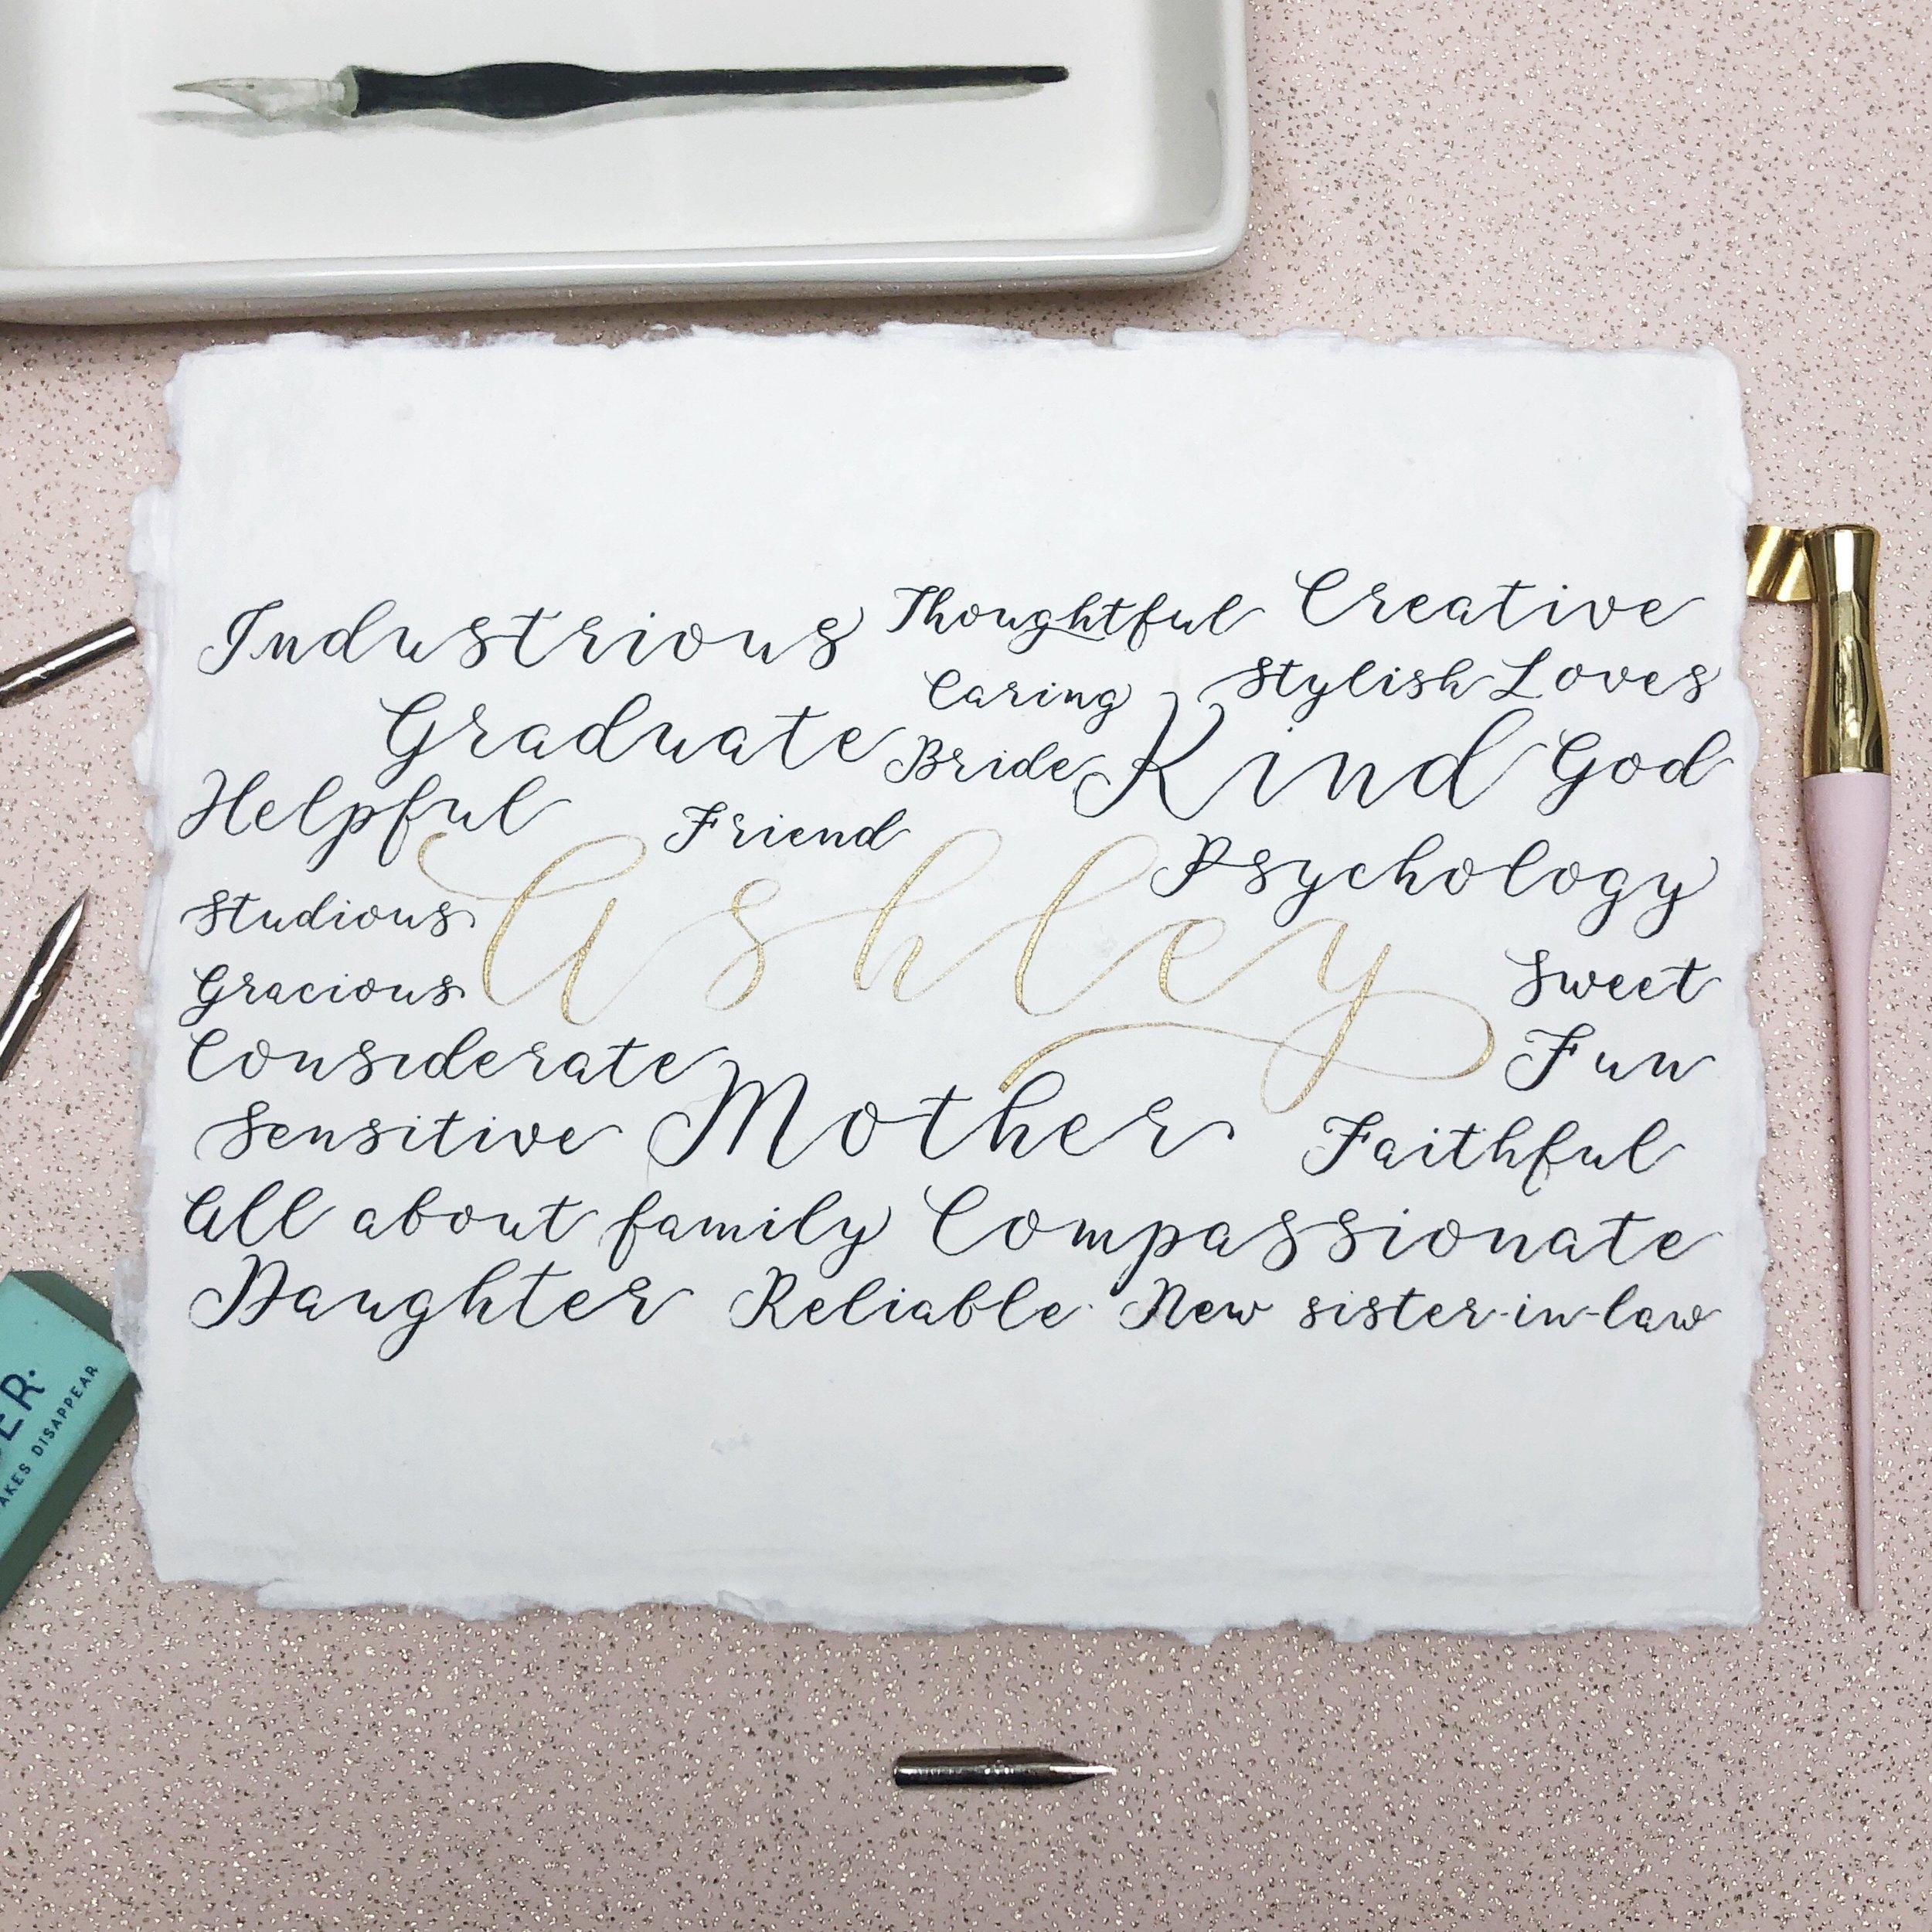 Central PA, York PA, JesSmith Designs, custom, wedding, invitations, bridal, Harrisburg, hanover, calligraphy, baltimore, wedding invitations, lancaster, gettysburg, 08-14 09.11.11.jpg